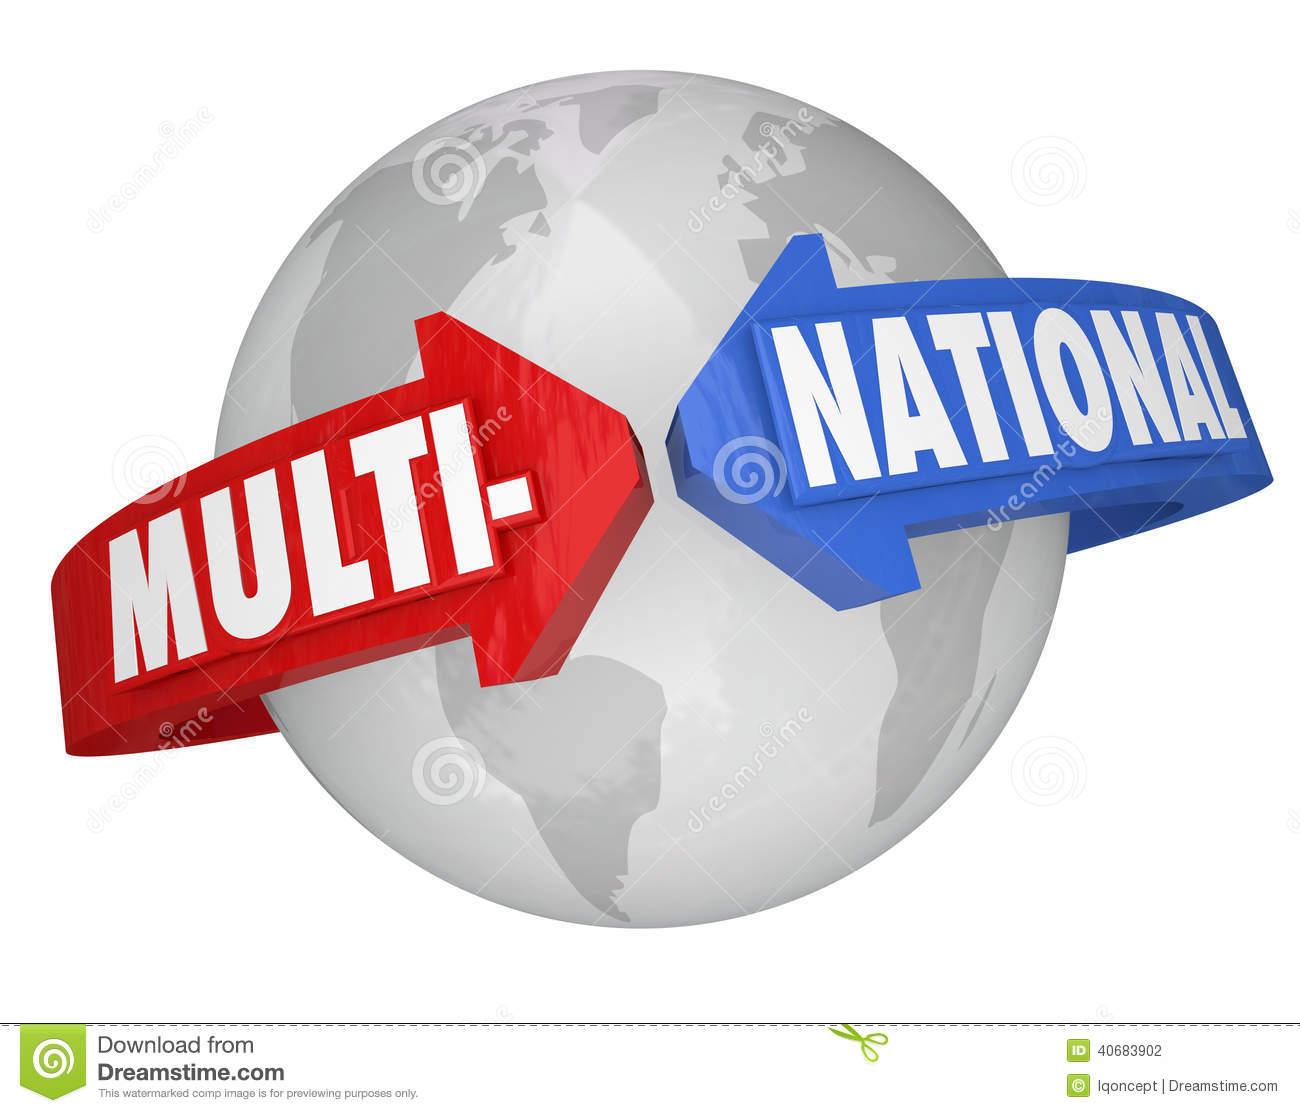 Multinational clipart.